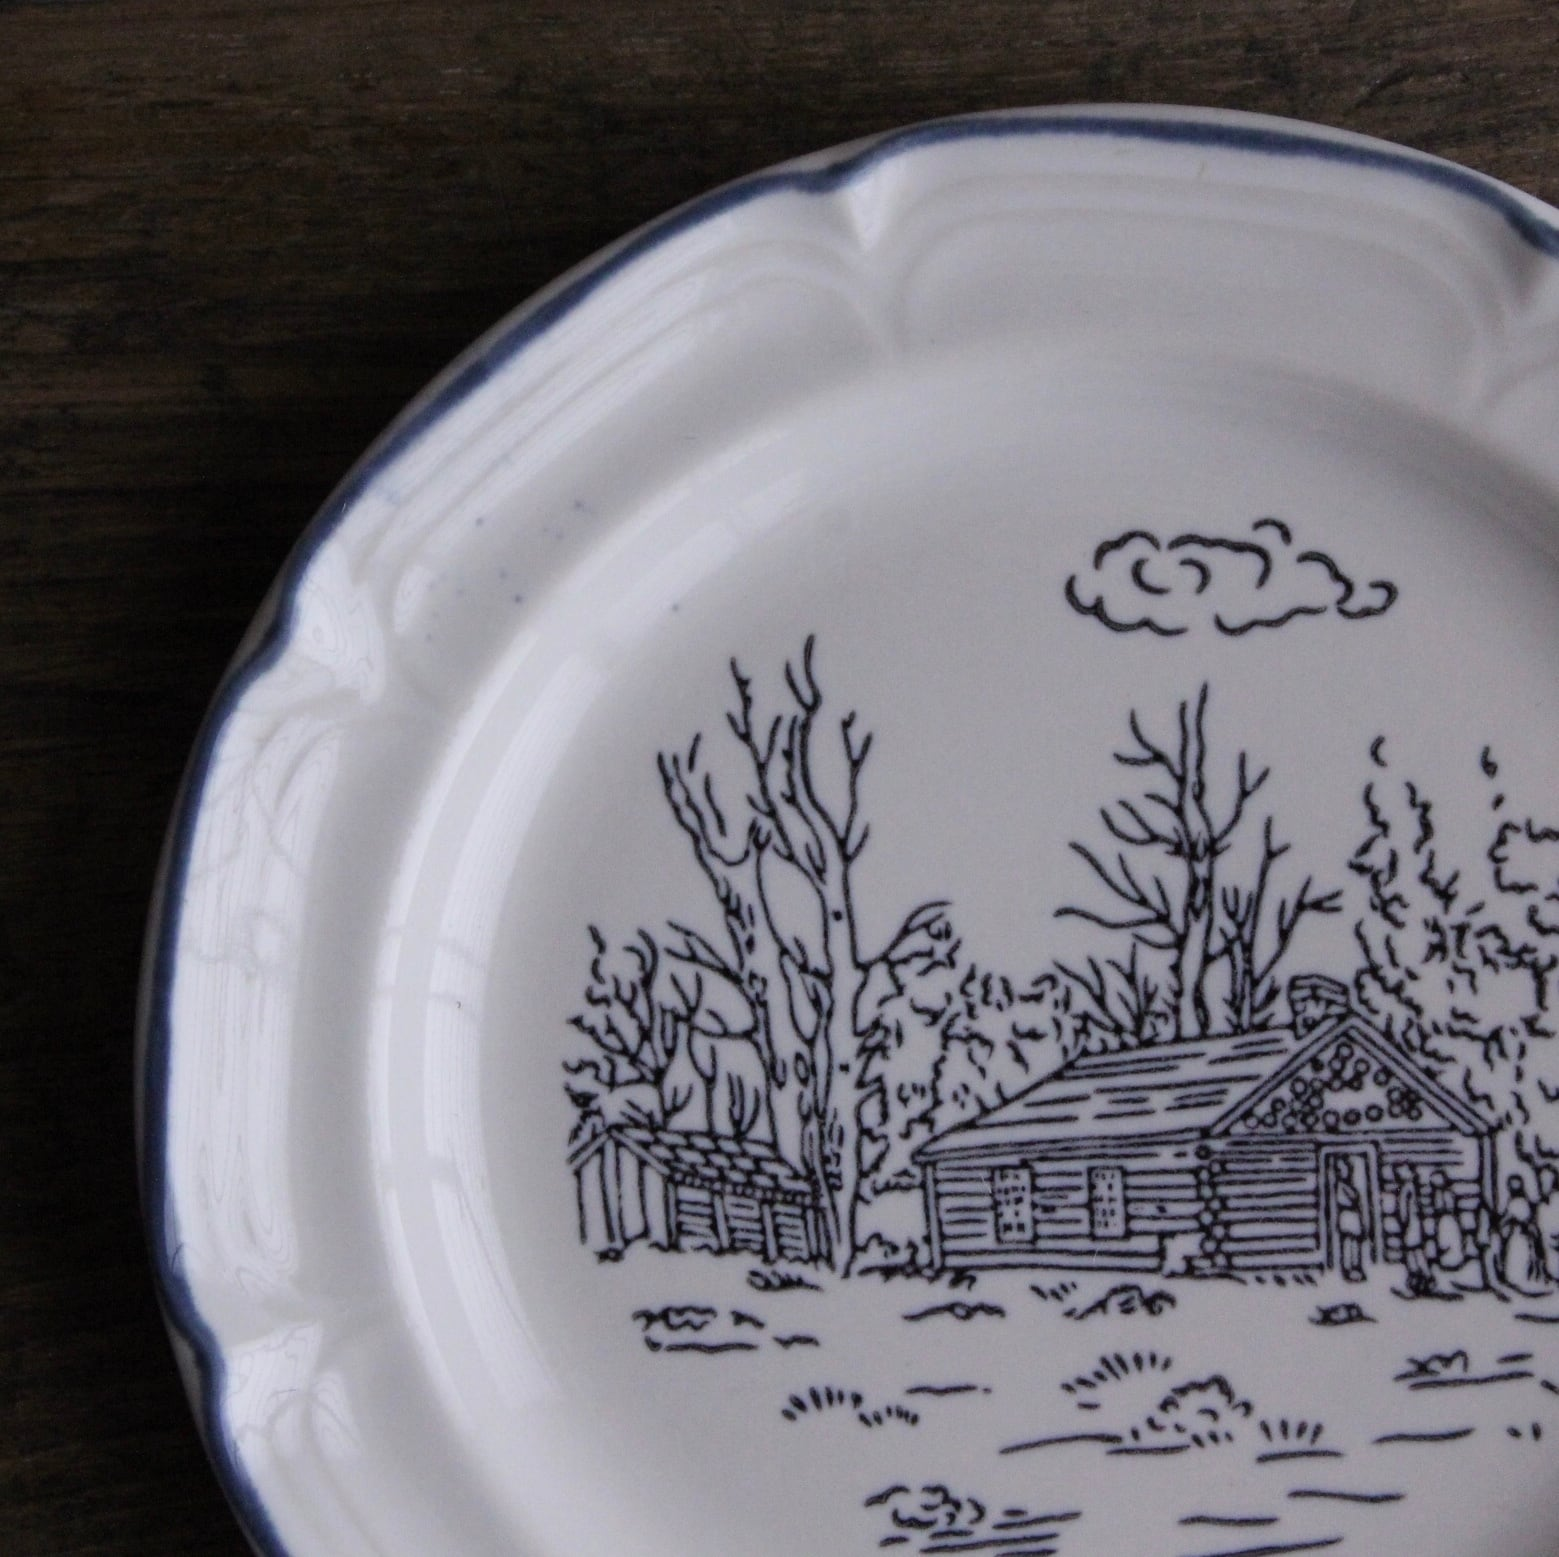 JISO ほのぼの絵柄のストーンウェア 取皿 在庫1枚